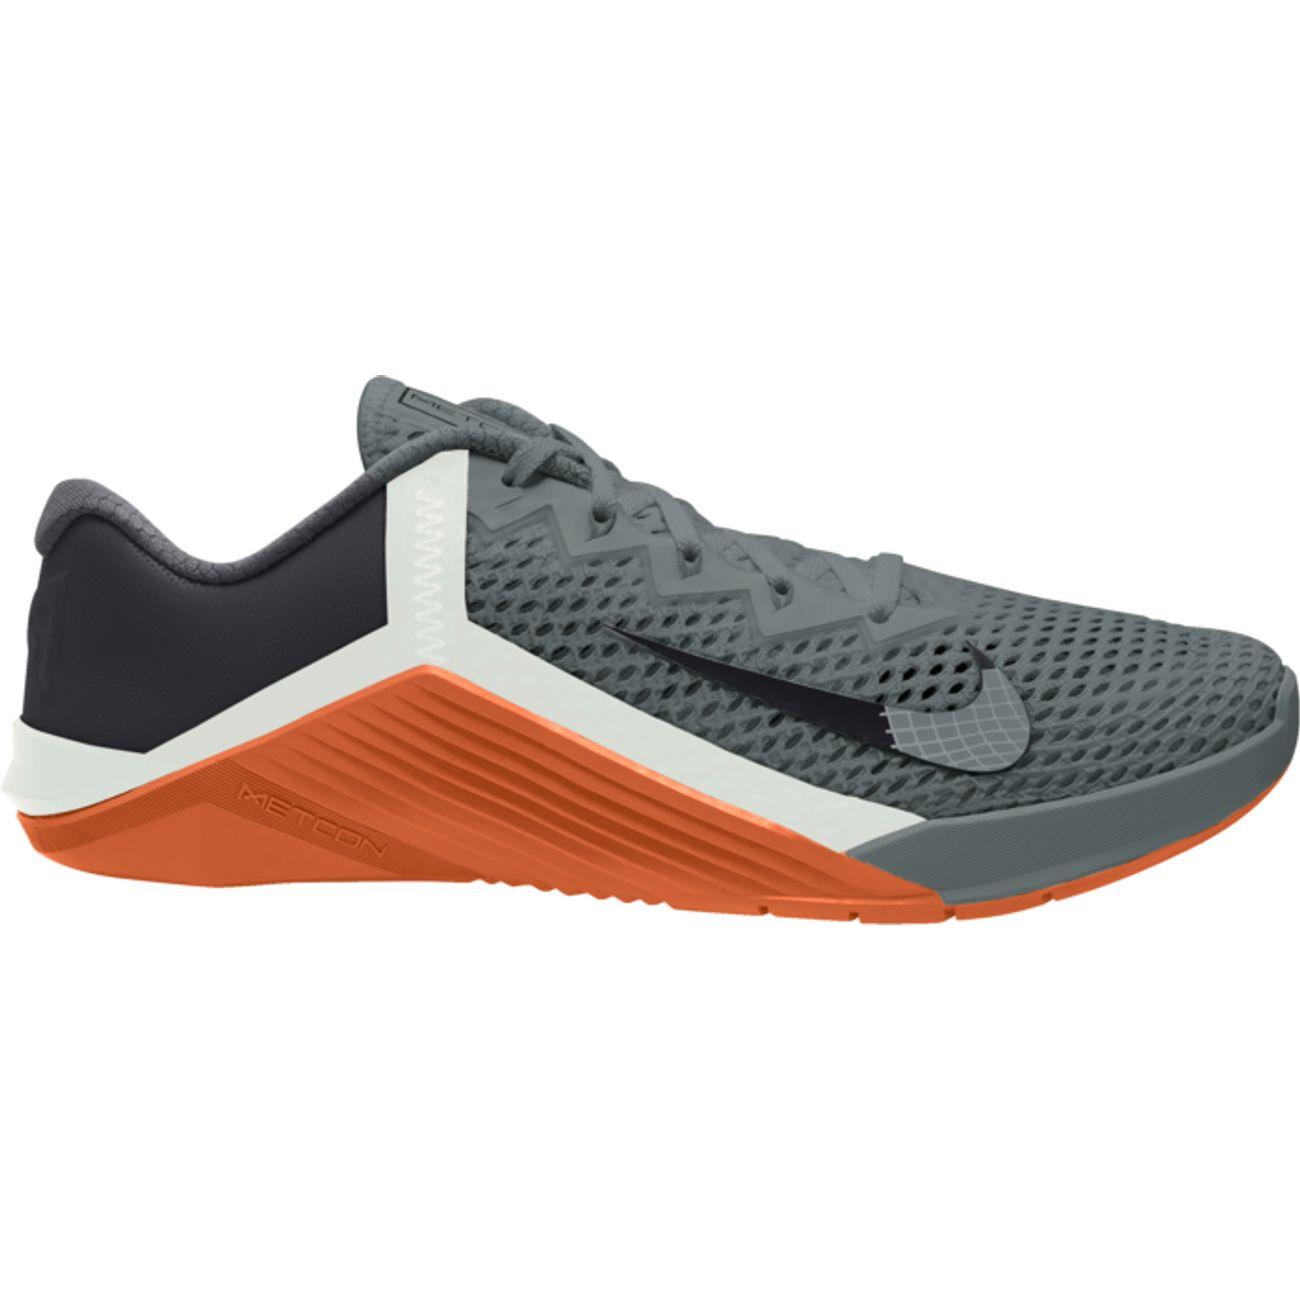 Chaussures Nike Crossfit Metcon 6